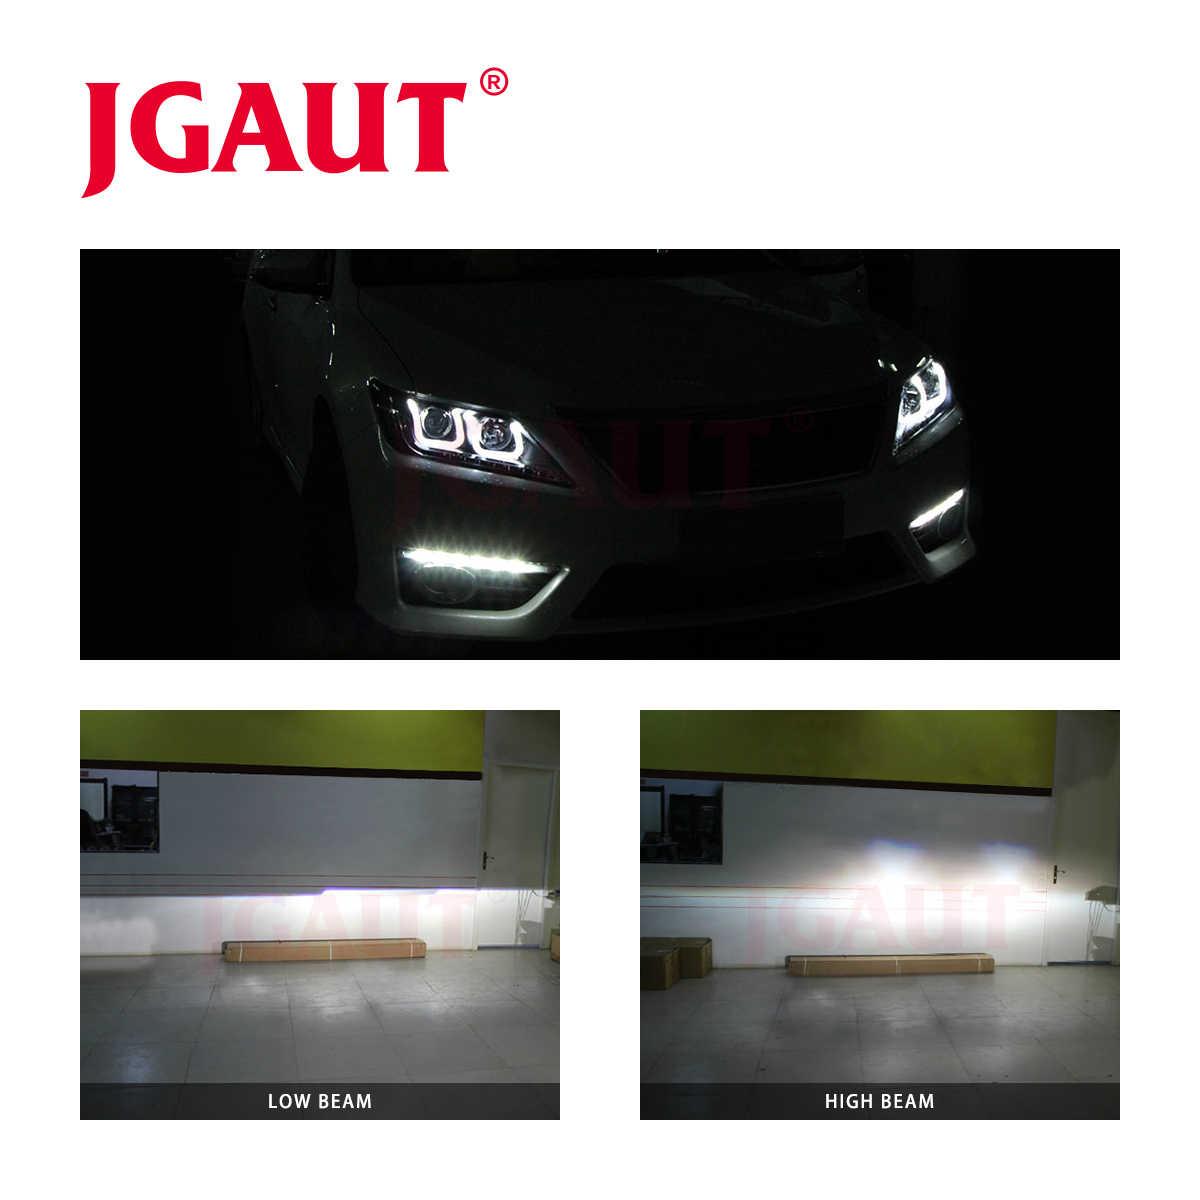 Car Assembly Head Lamp for toyota camry Headlights 2012-2014 LED Headlight DRL Lens Double Beam Bi-Xenon HID Q5 Whole kit